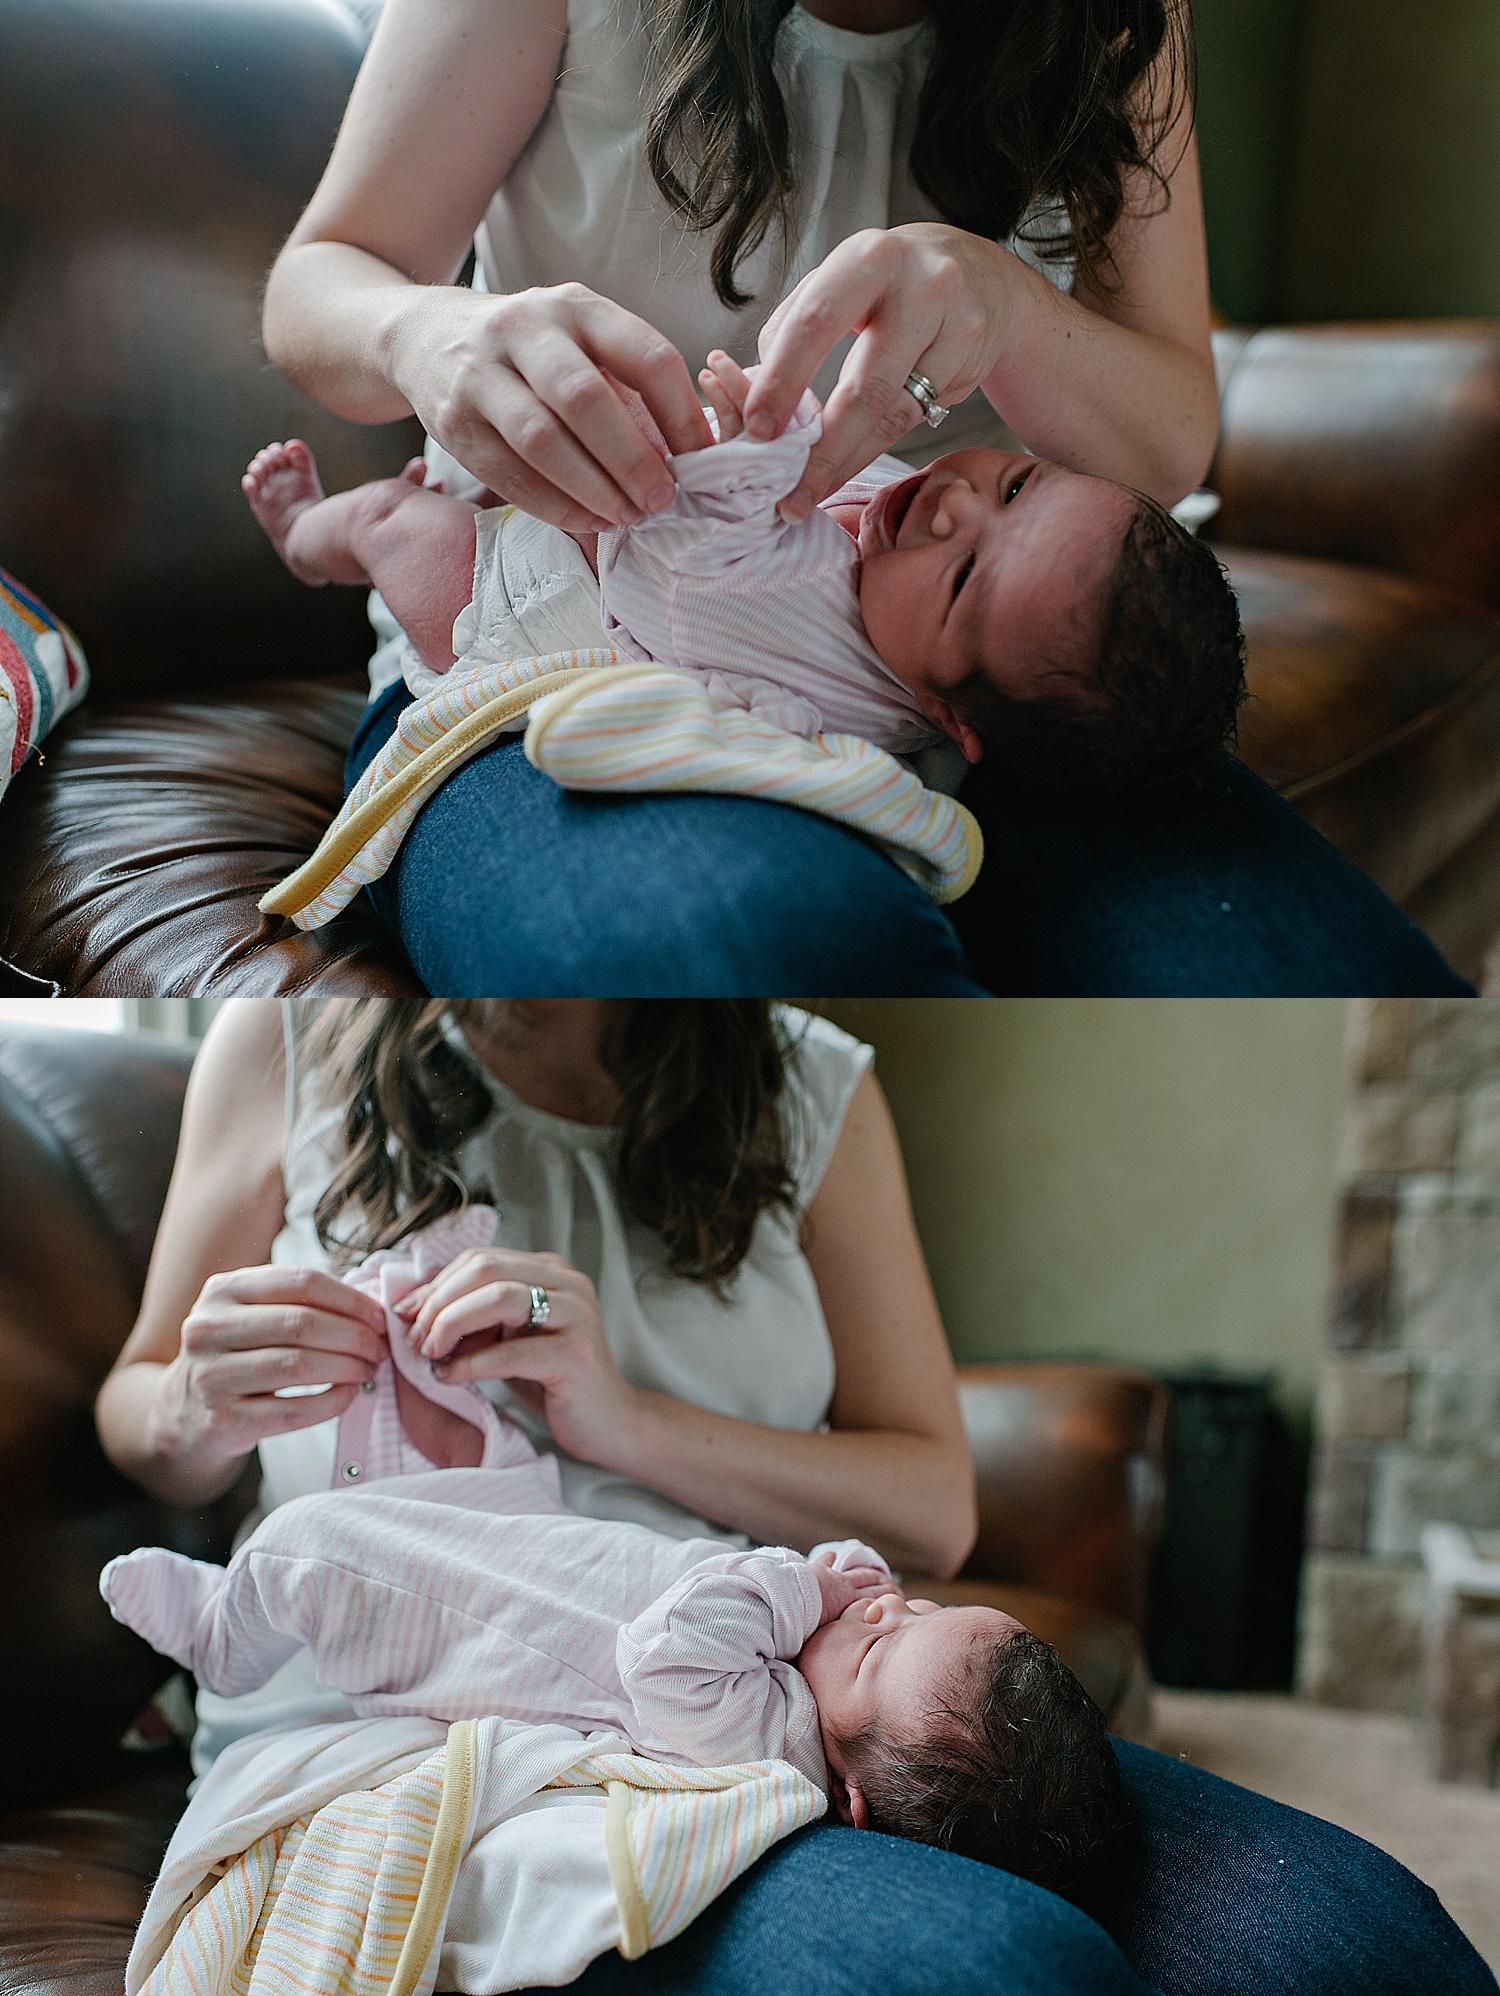 akron-ohio-newborn-family-photographer-cleveland-canton-lauren-grayson-photography